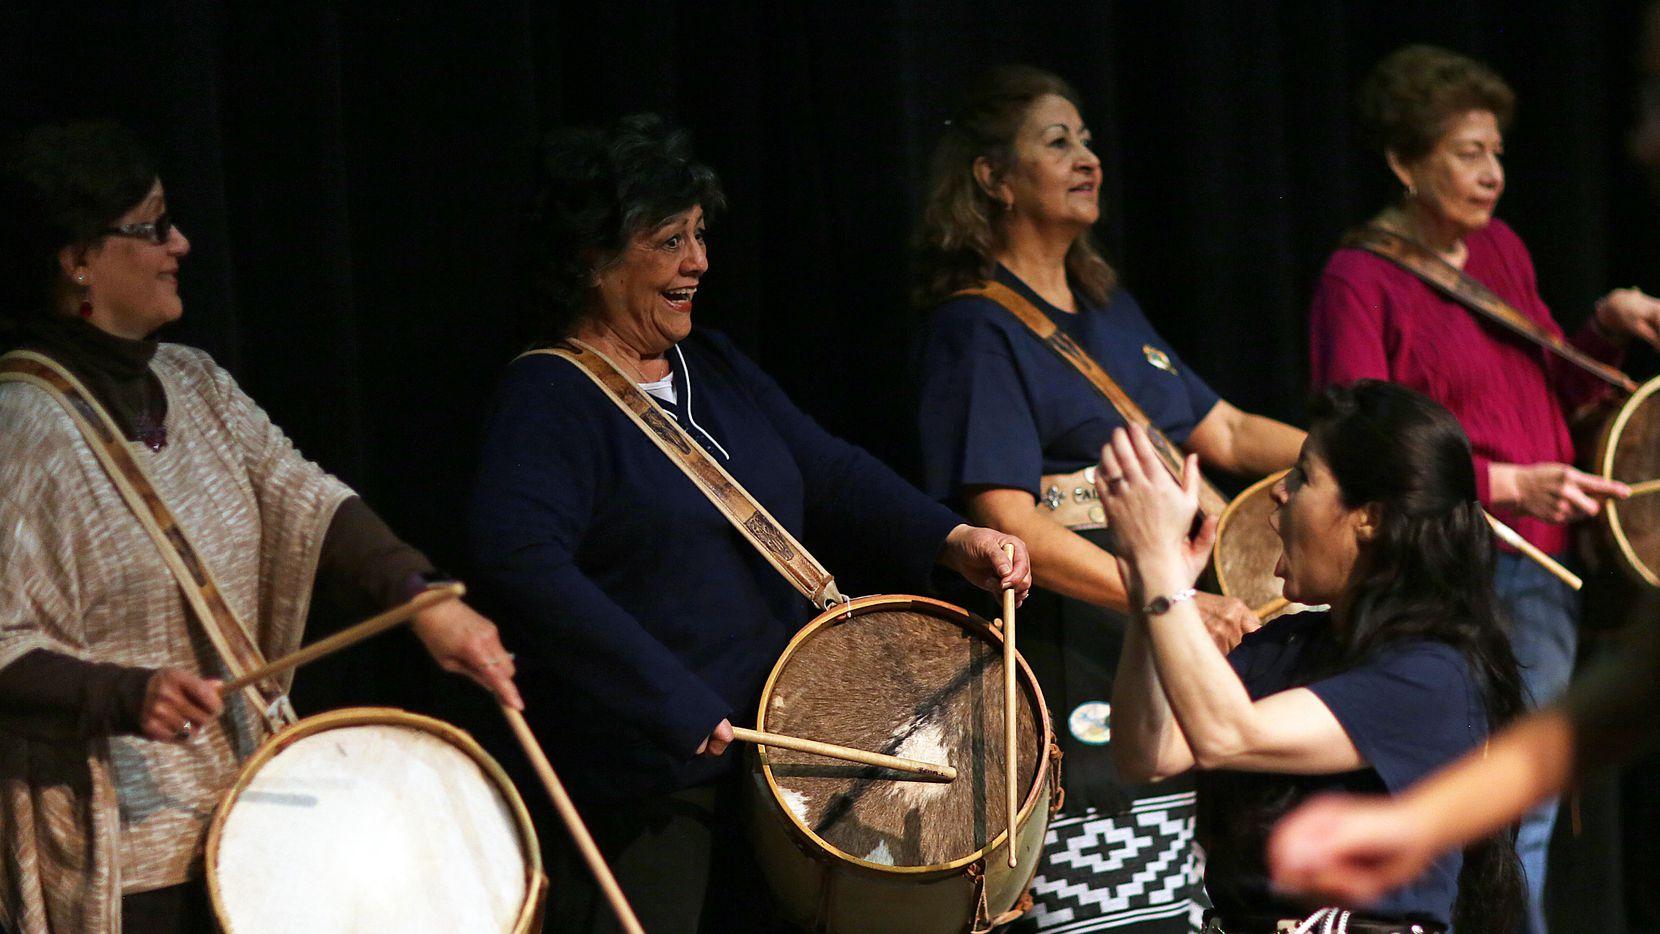 Lidia López (der.) dirige la clase de folklore argentino en el Centro Cultural Latino.(Foto de Omar Vega/Especial para Al Dia)